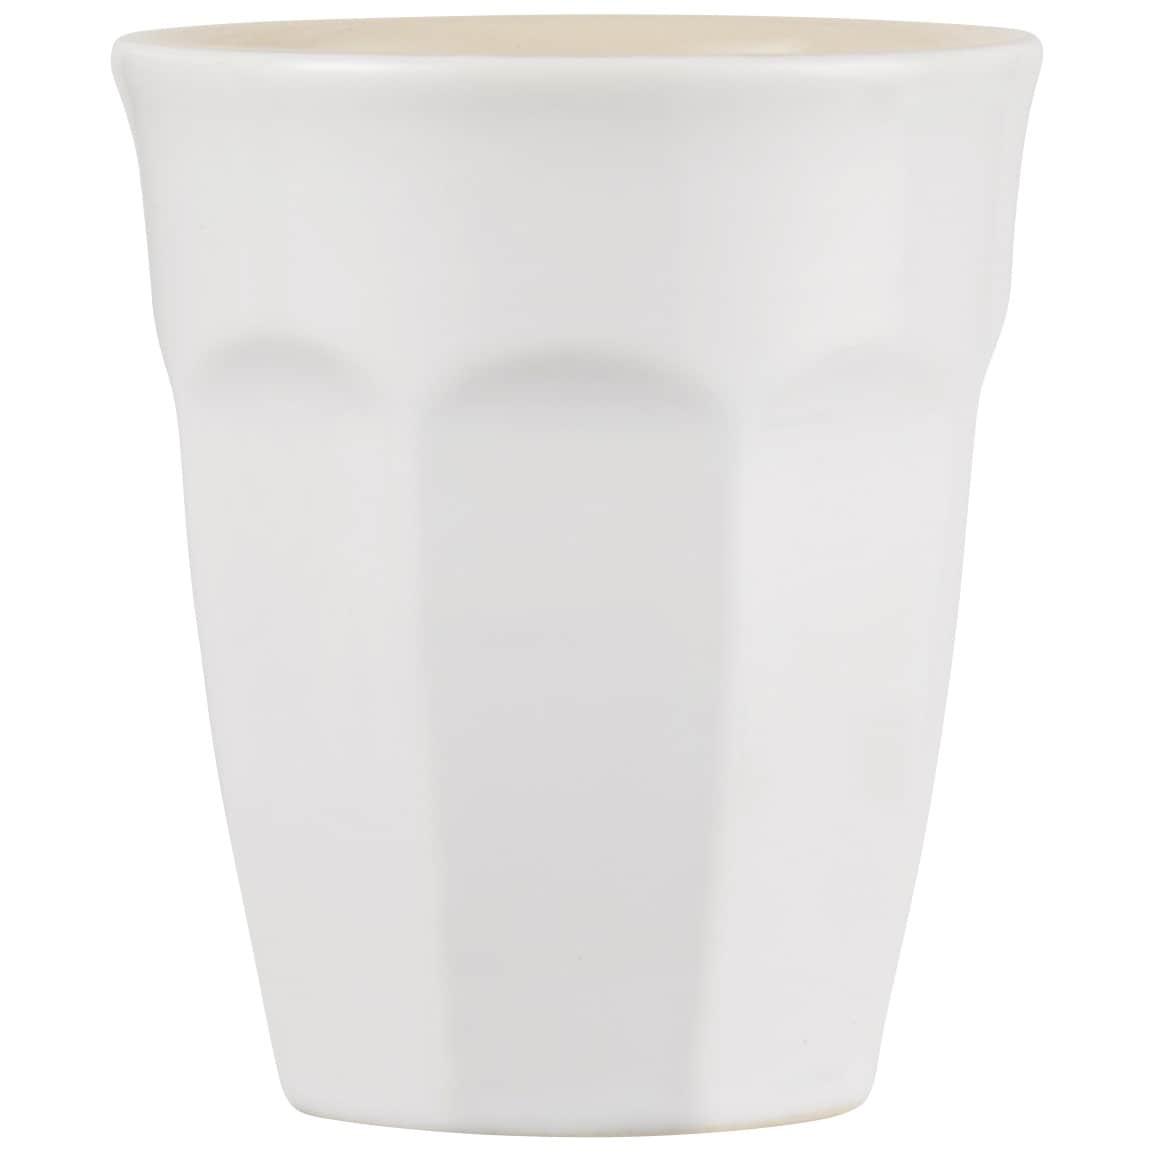 IB LAURSEN Latte hrneček Mynte Pure White 250 ml, bílá barva, keramika